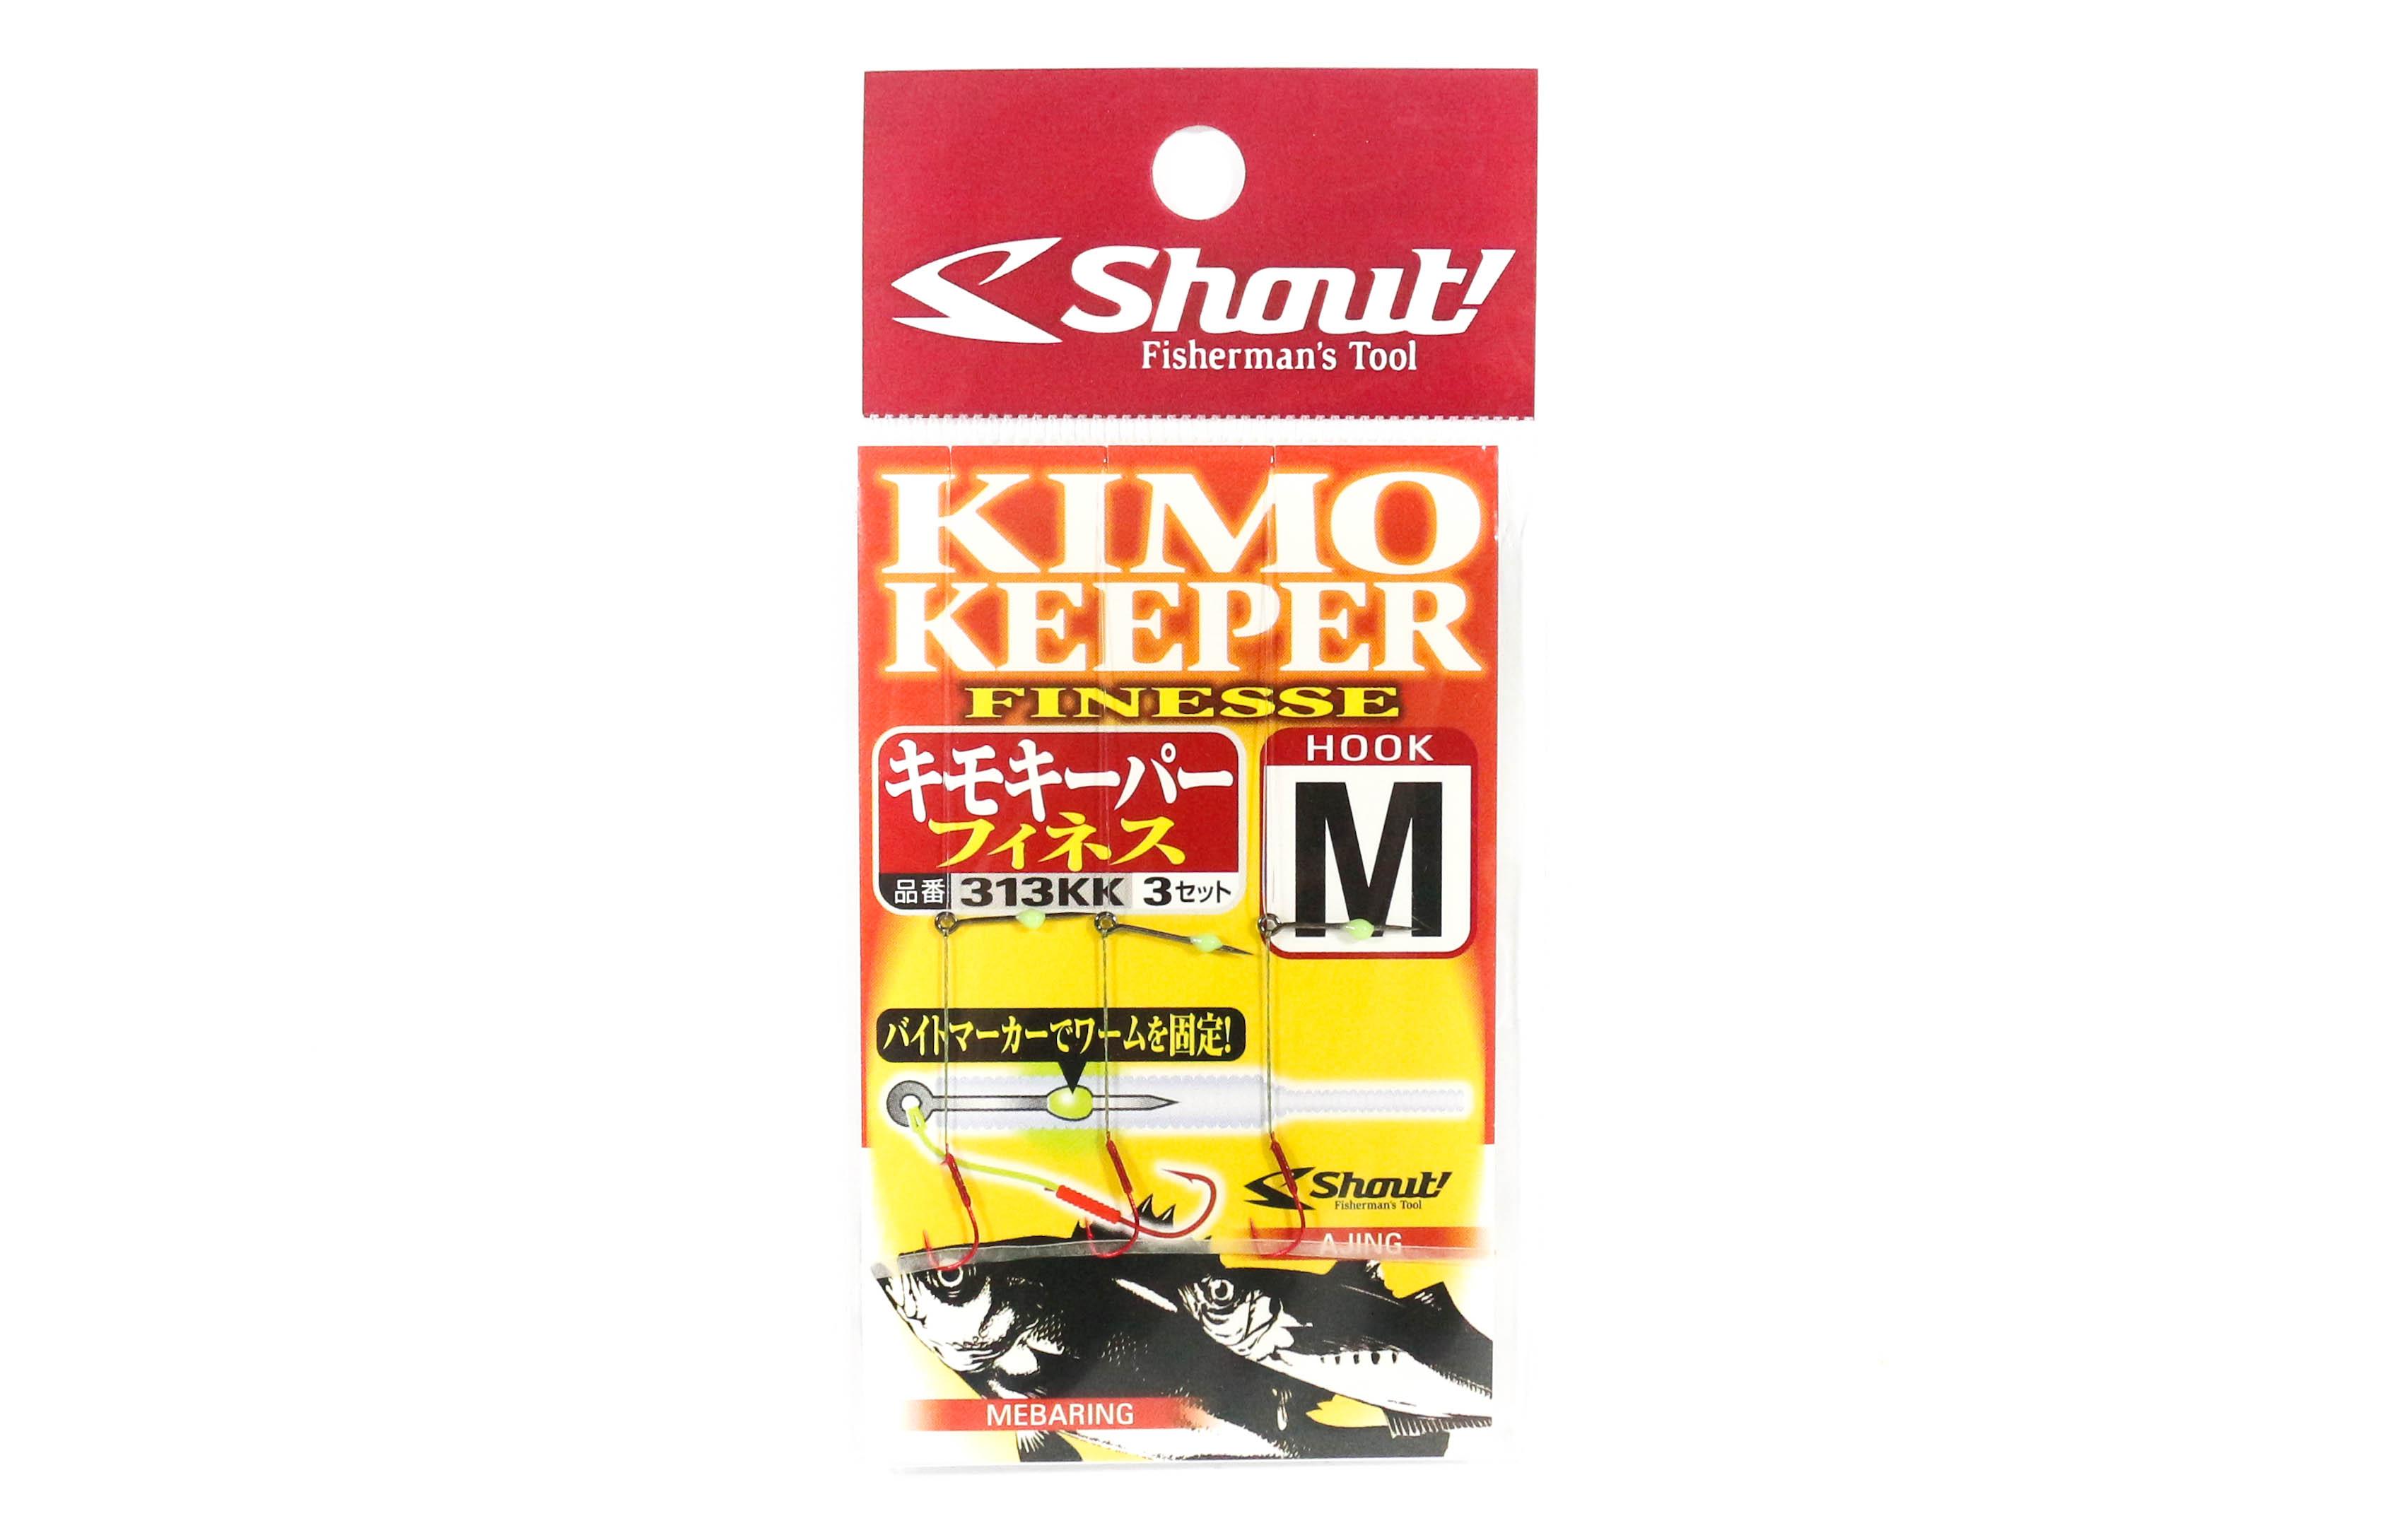 Sale Shout 313-KK Kimo Keeper Ultralight Yamame Worm Hook 2cm Size M (3462)